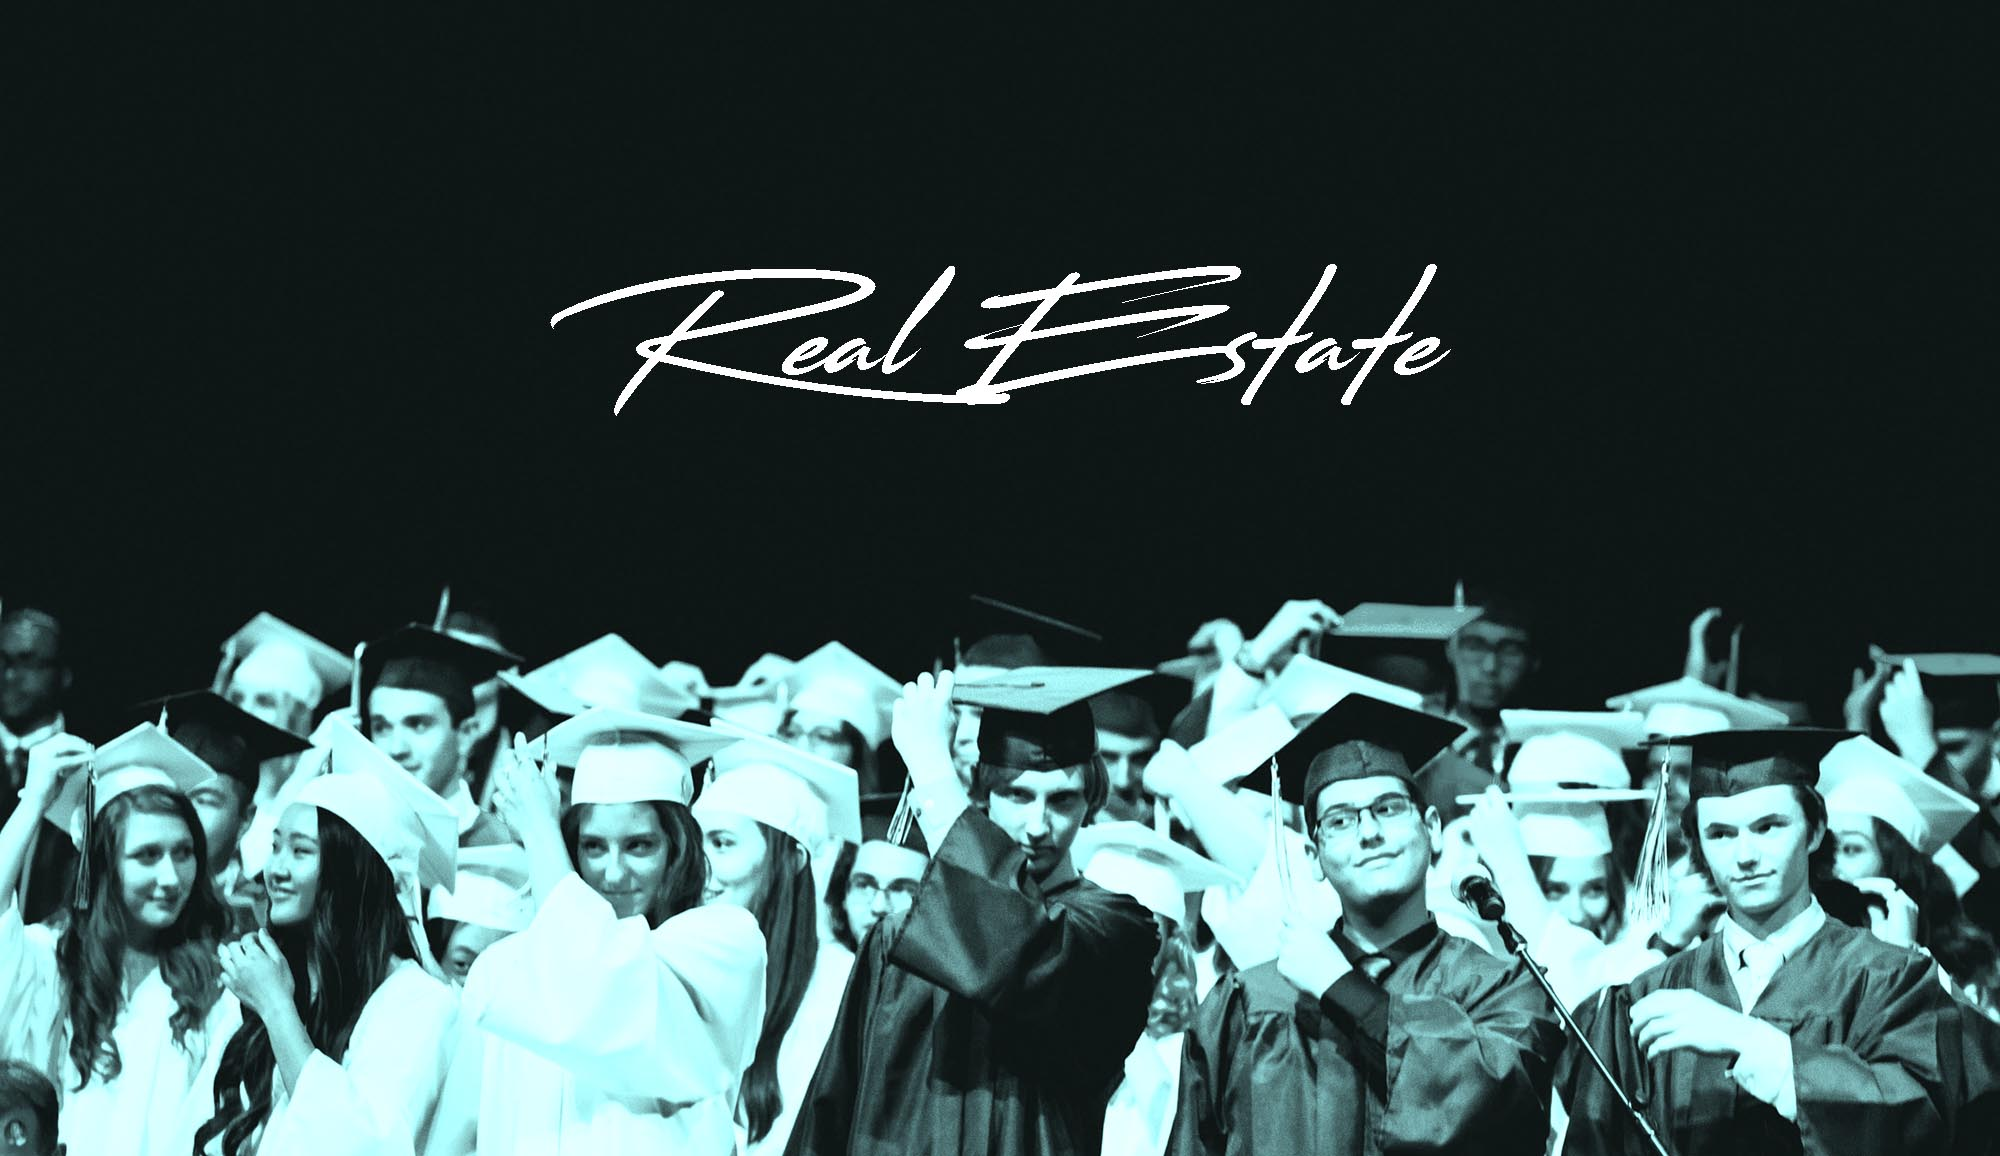 Real Estate Schools: Top 3 Educational Establishments in California